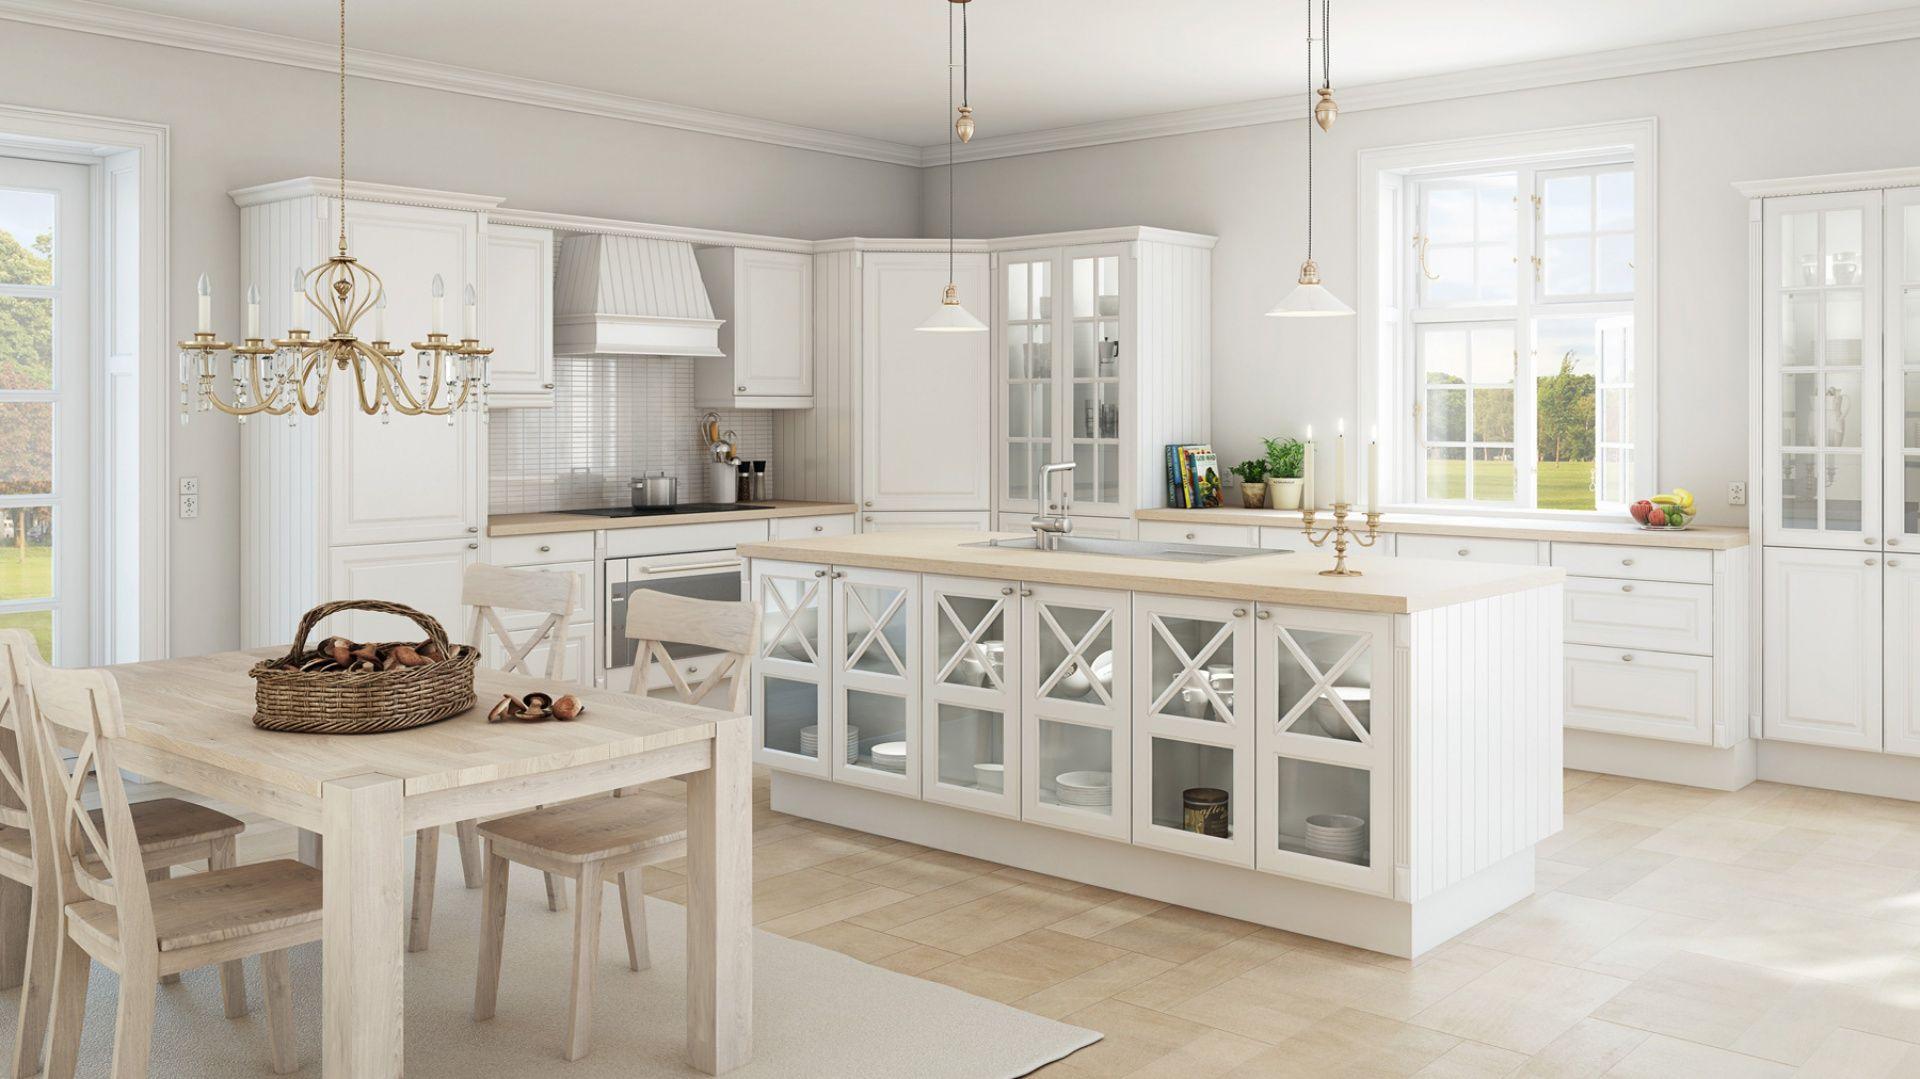 Najpiekniejsze Kuchnie W Stylu Klasycznym Interior Design Kitchen Kitchen Design Home Decor